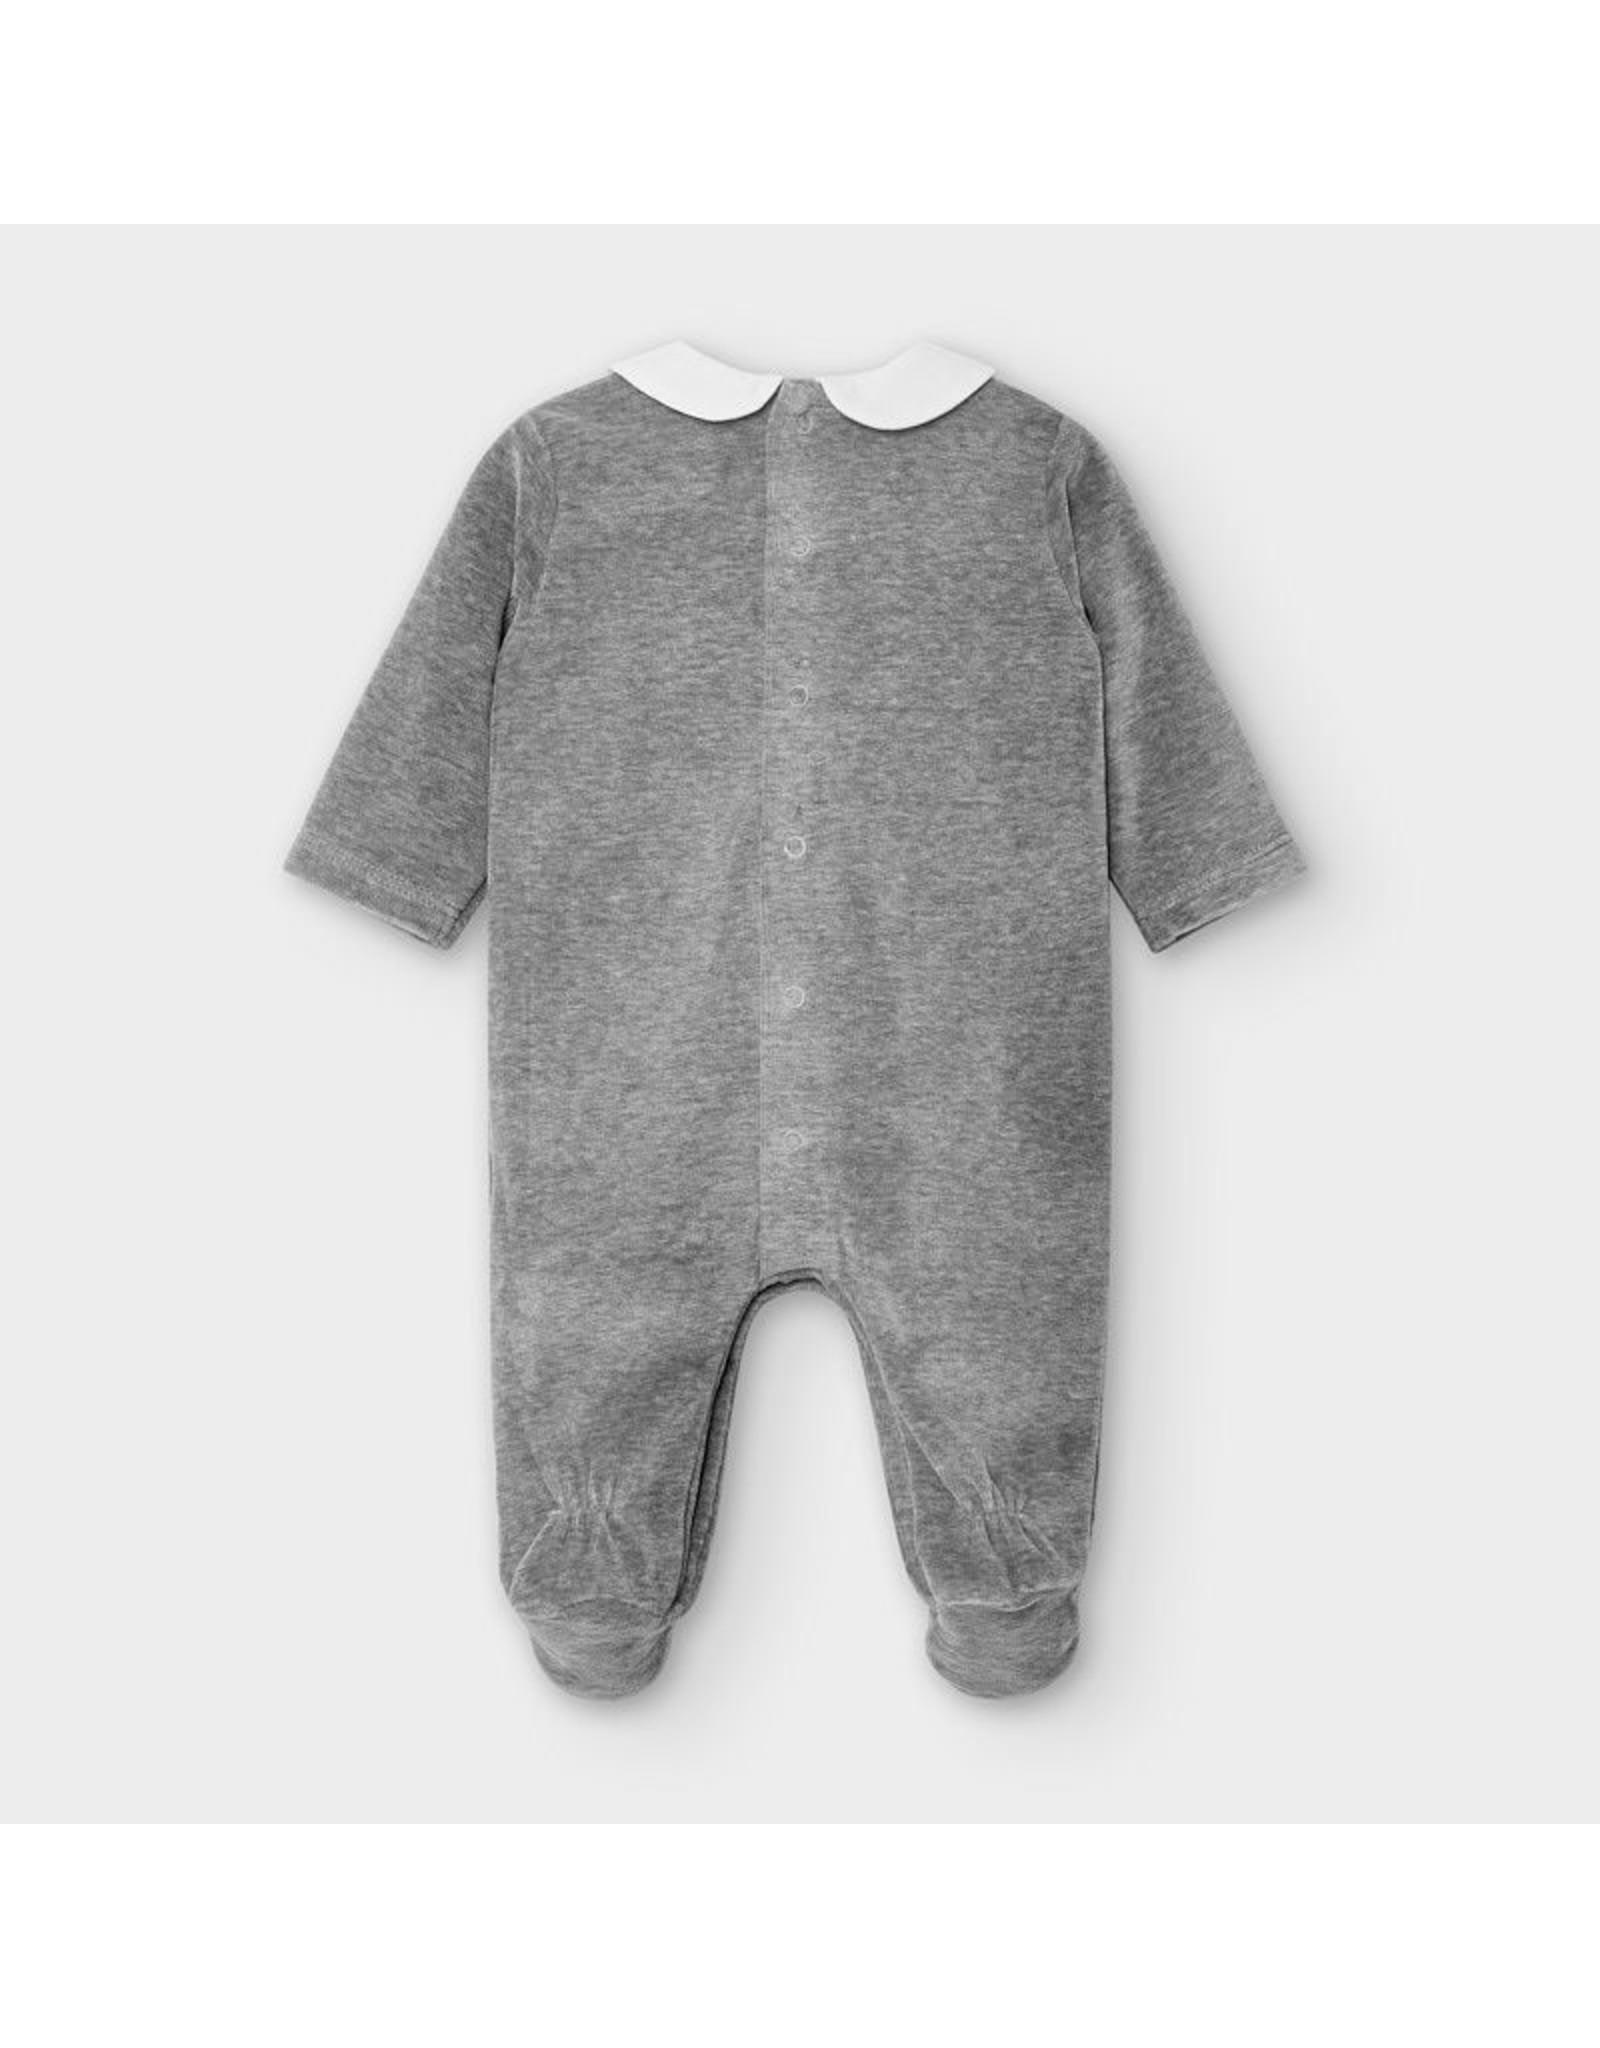 Mayoral Pajamas in Grey Moon